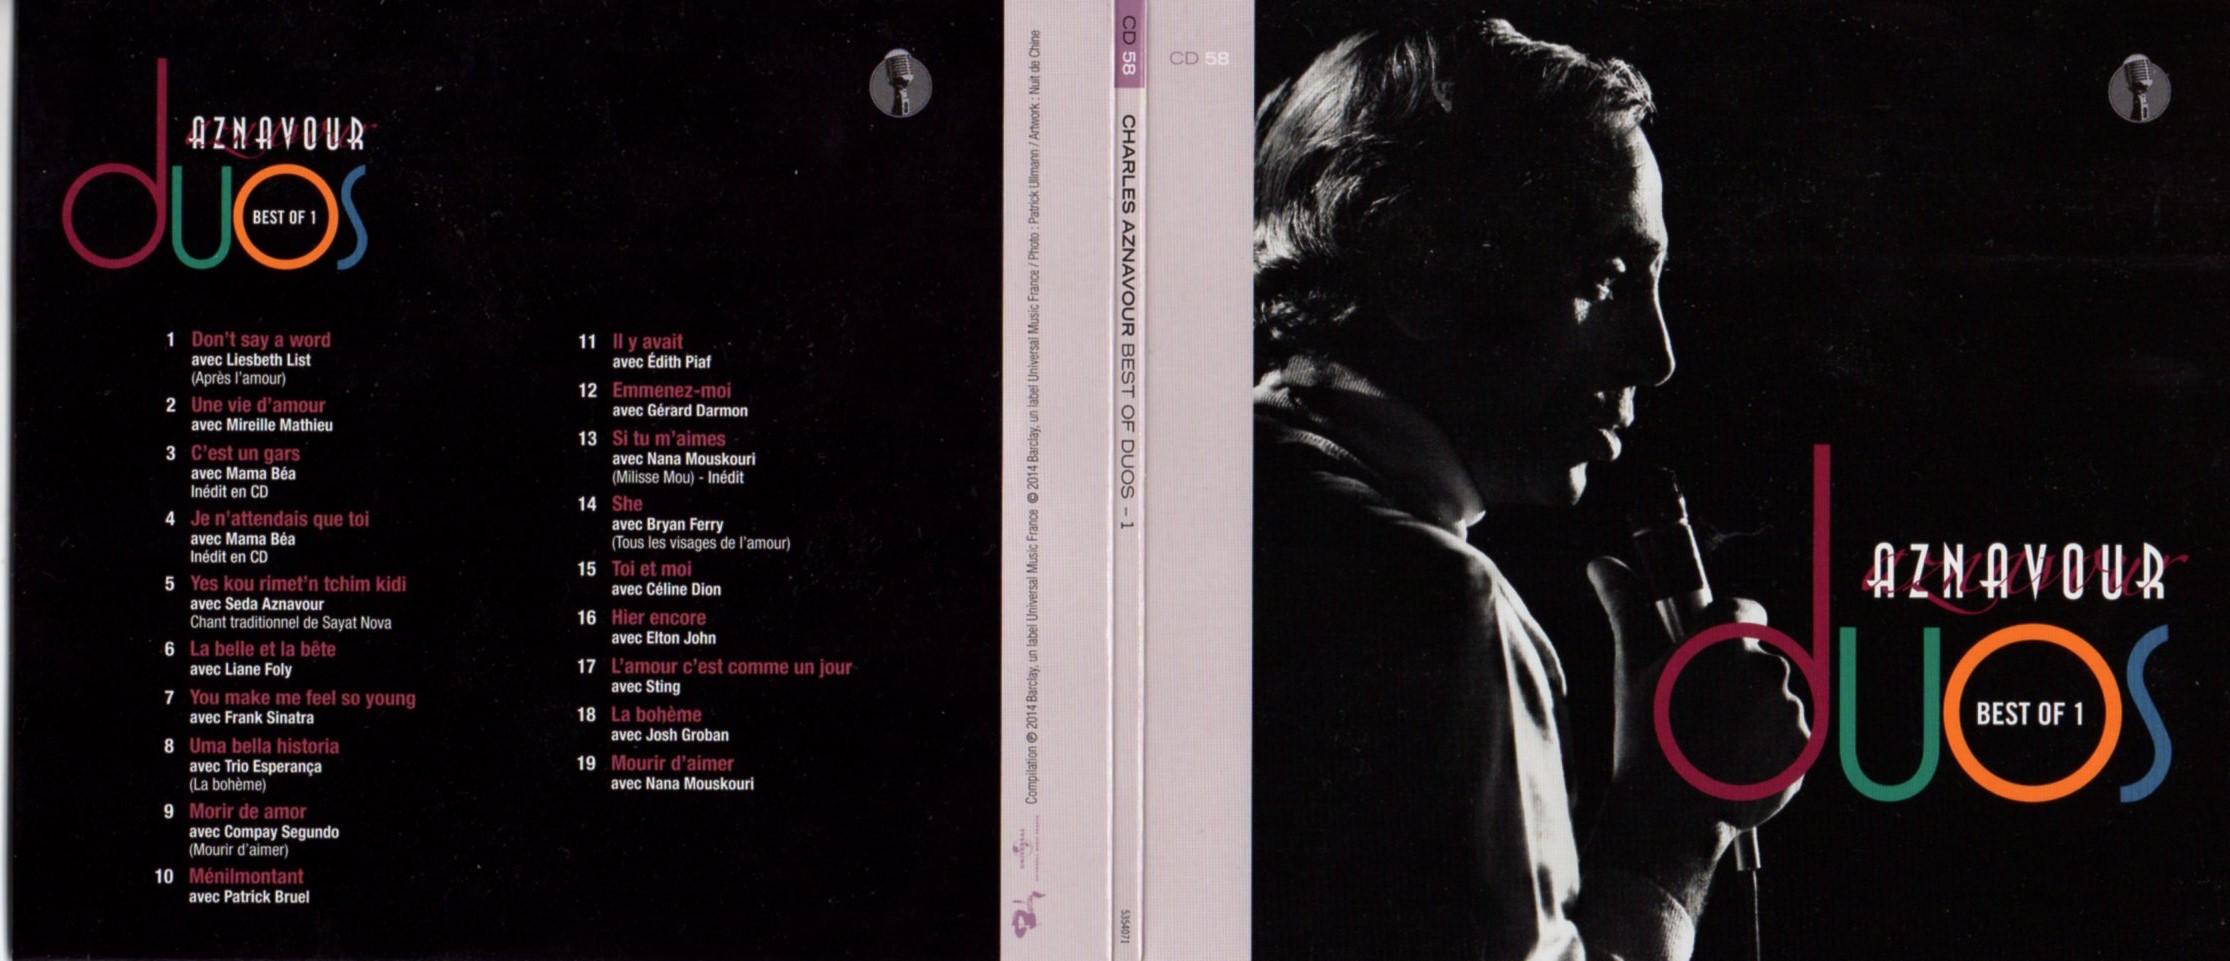 CHARLES AZNAVOUR - MIREILLE MATHIEU - NANA MOUSKOU - Best of duos Vol 1 Gatefold Card board sleeve - CD